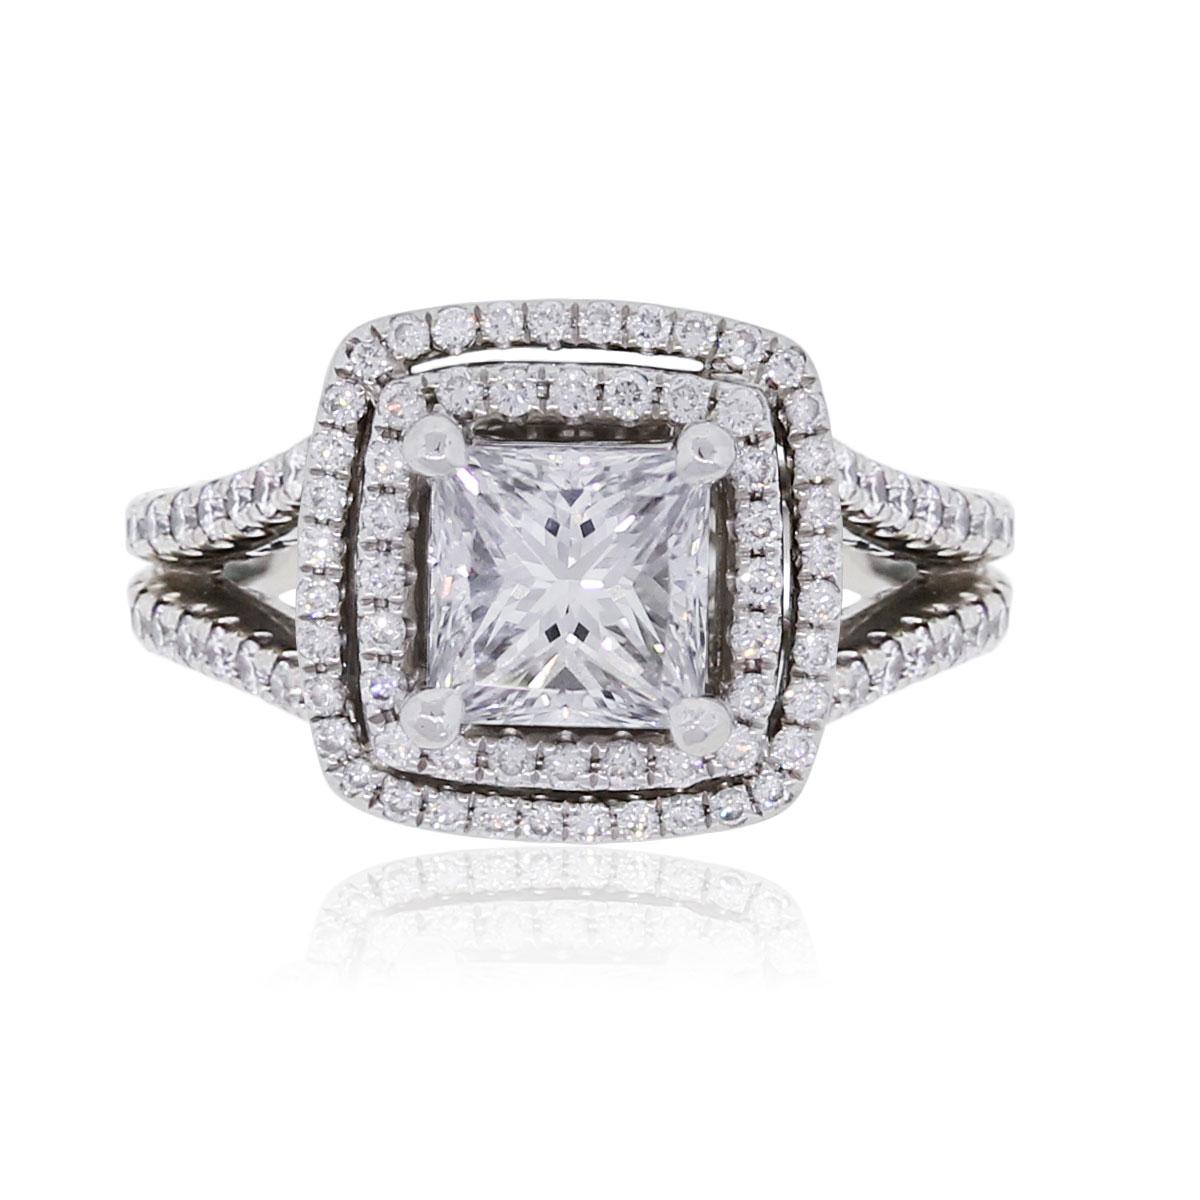 Platinum 1.57ct GIA Certified Princess Cut Diamond Double Halo Engagement Ring